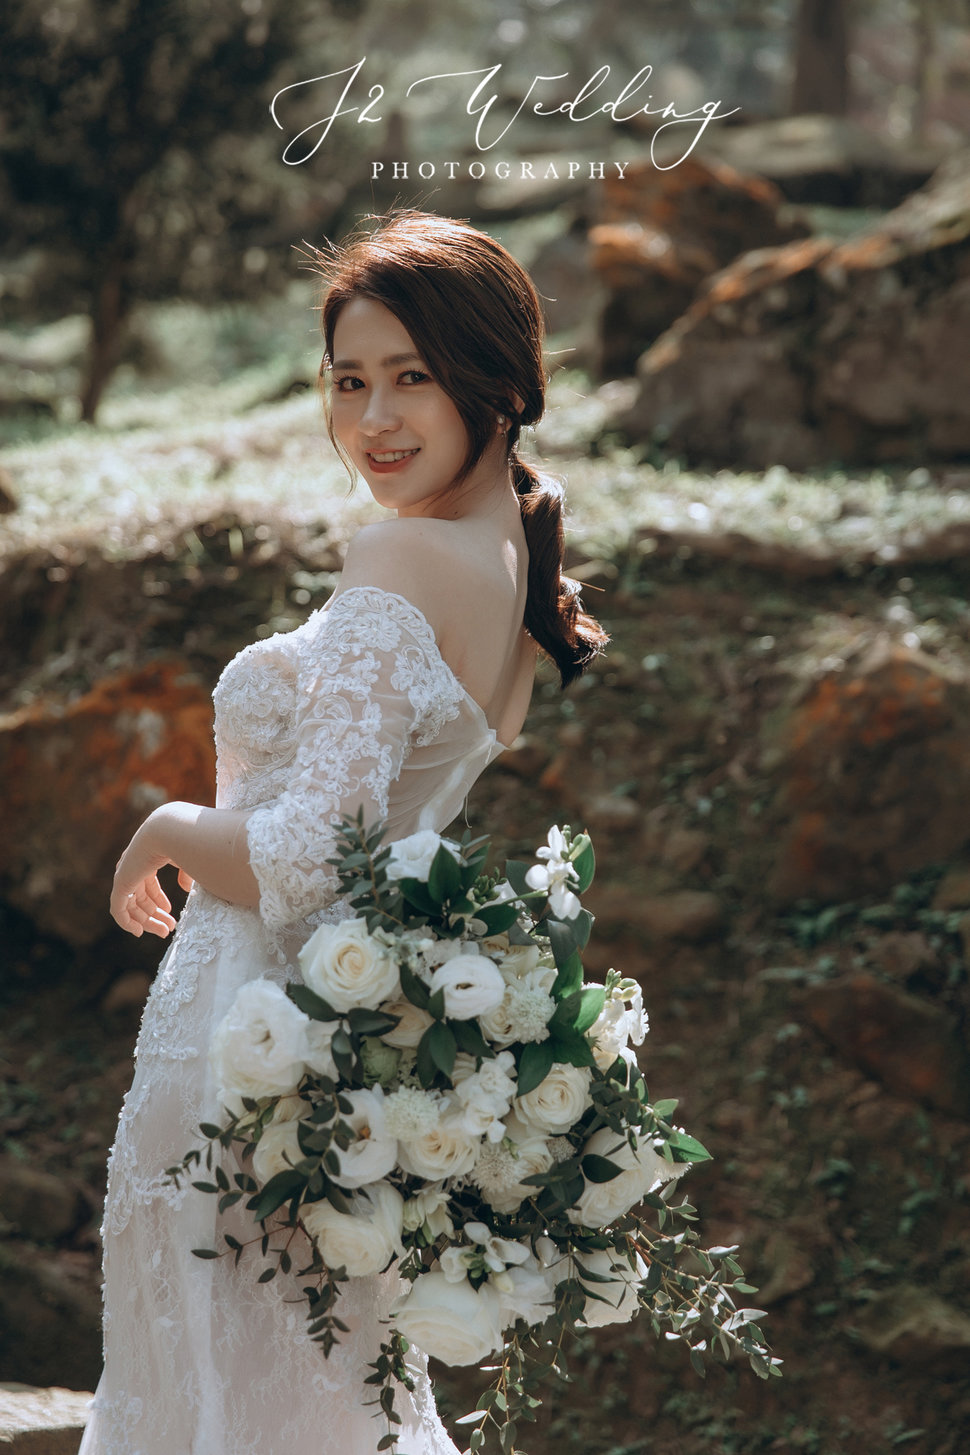 069A00017 - J2 wedding 中壢《結婚吧》